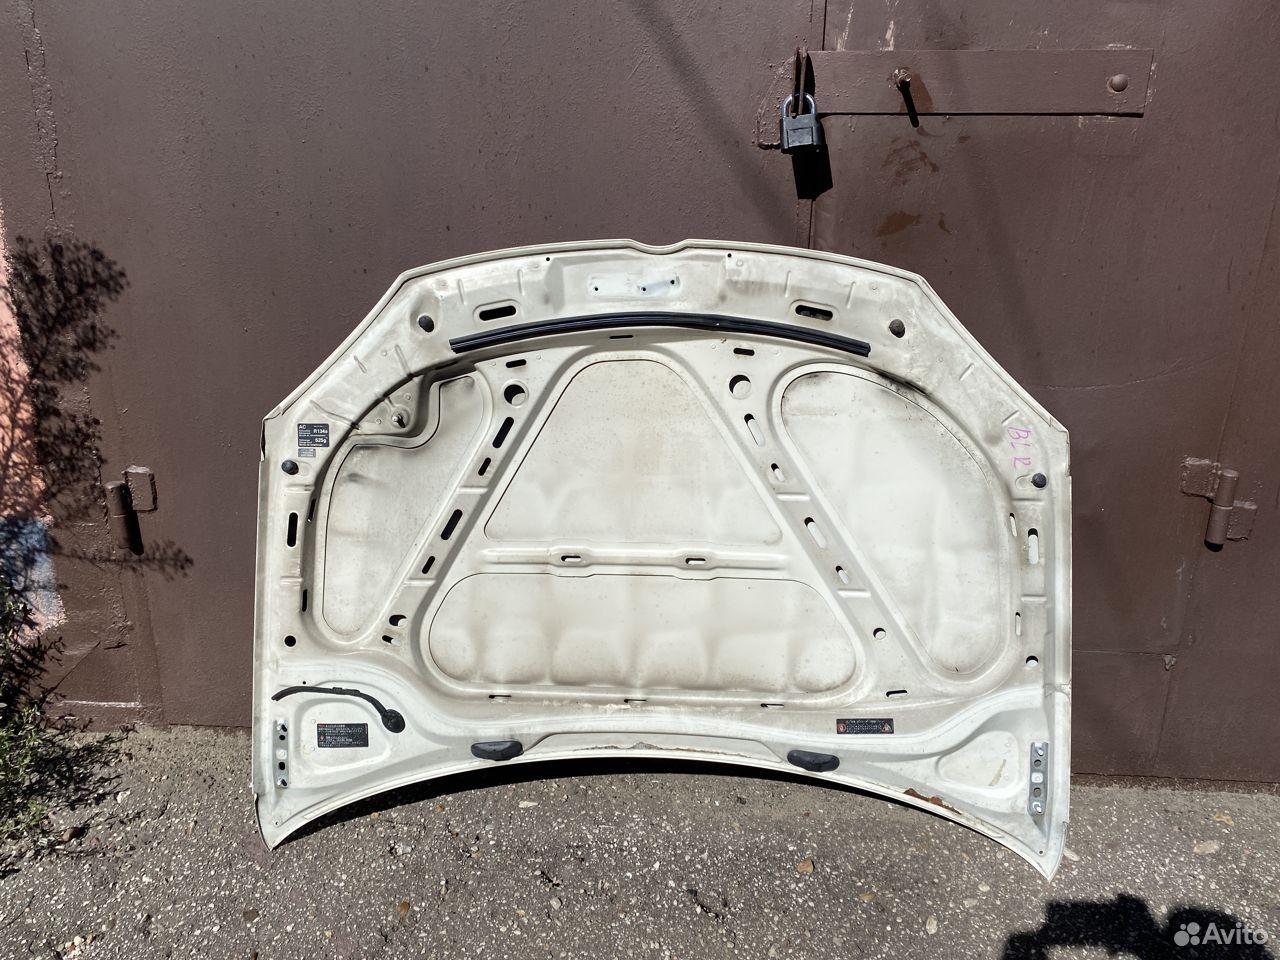 Капот белый Volkswagen Jetta 5, Golf 5 №2  89534684247 купить 4